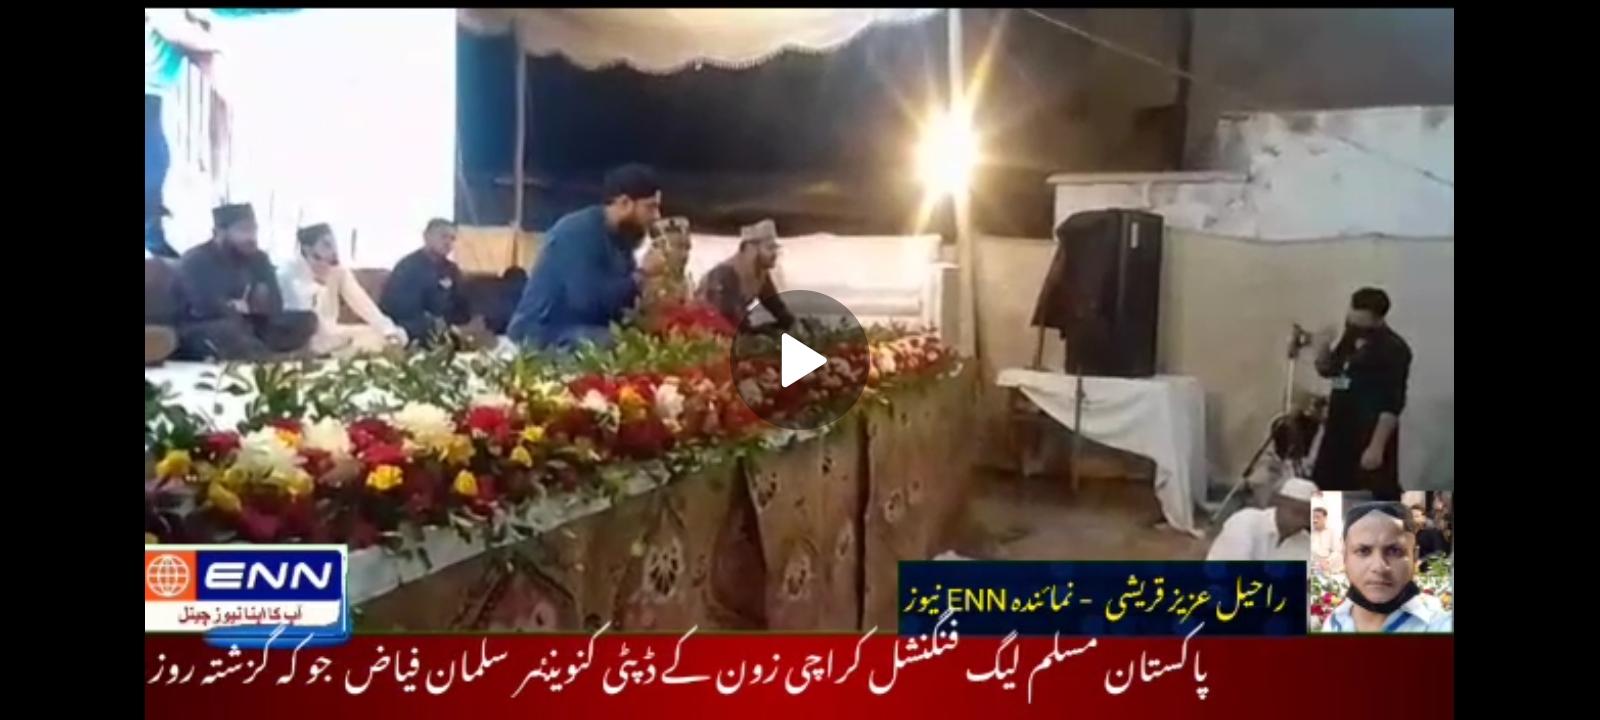 سوٸم براۓ ڈپٹی کنوینٸر پاکستان مسلم لیگ فنگنشل جناب  سلمان فیاض بھاٸی